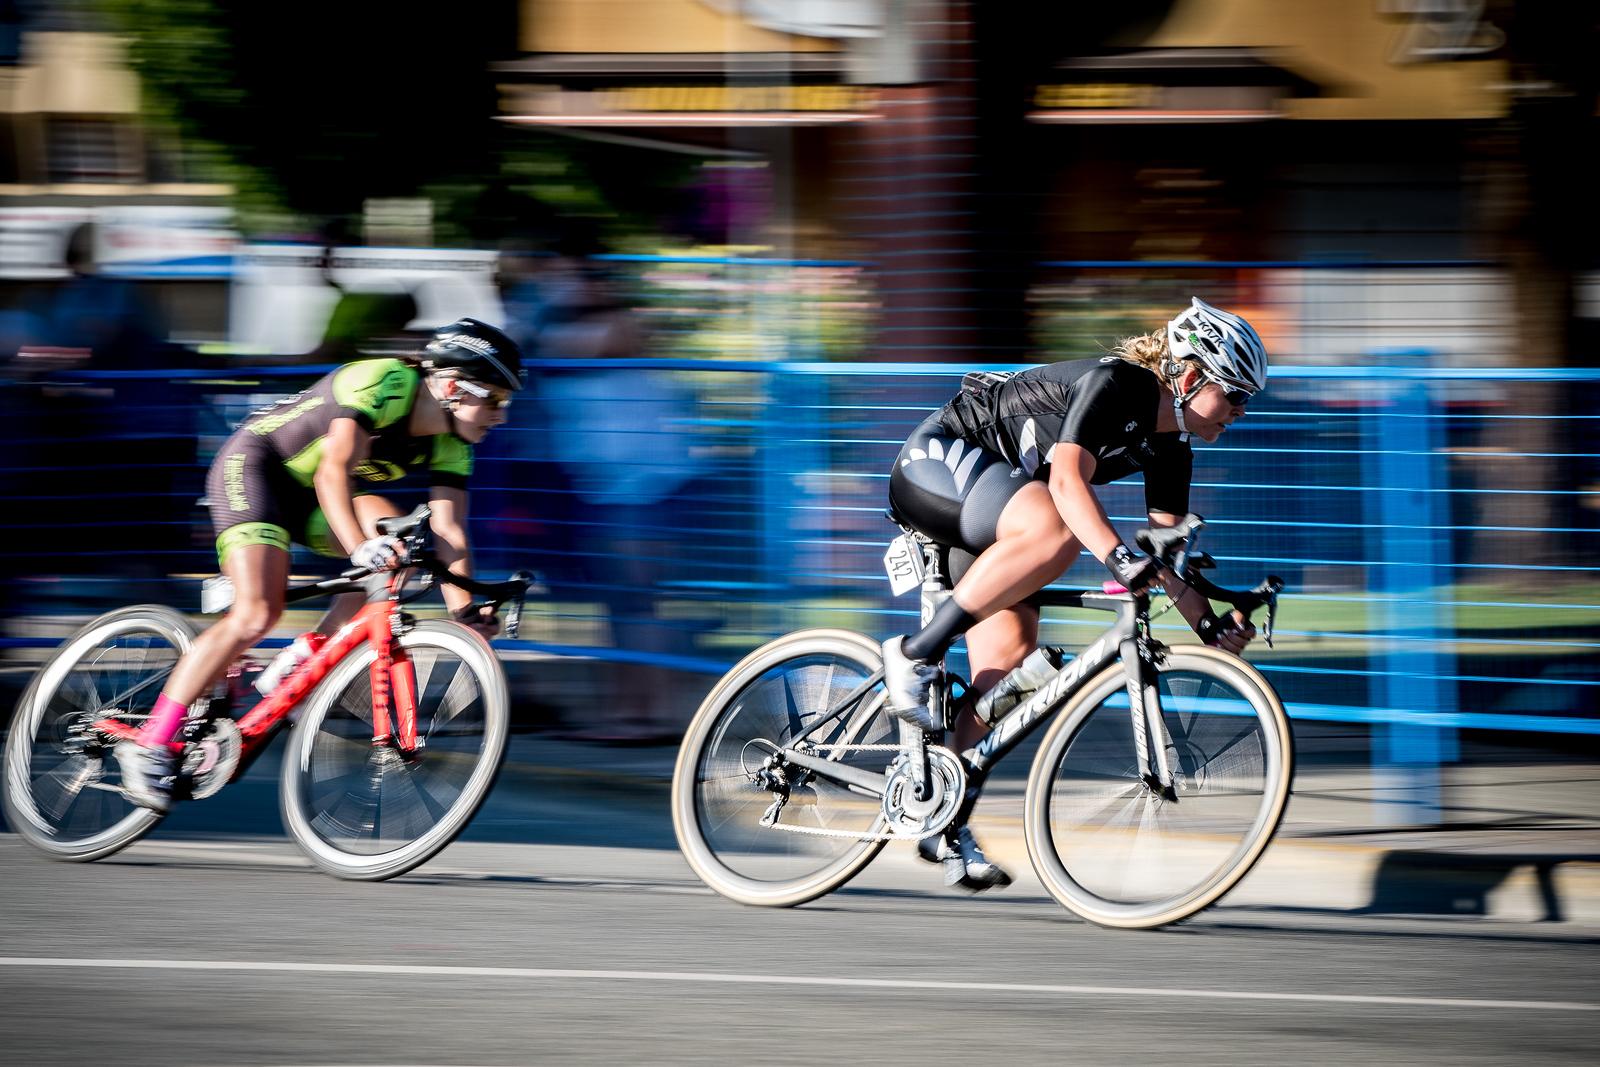 PoCo Grand Prix 2017. Photo By: Scott Robarts